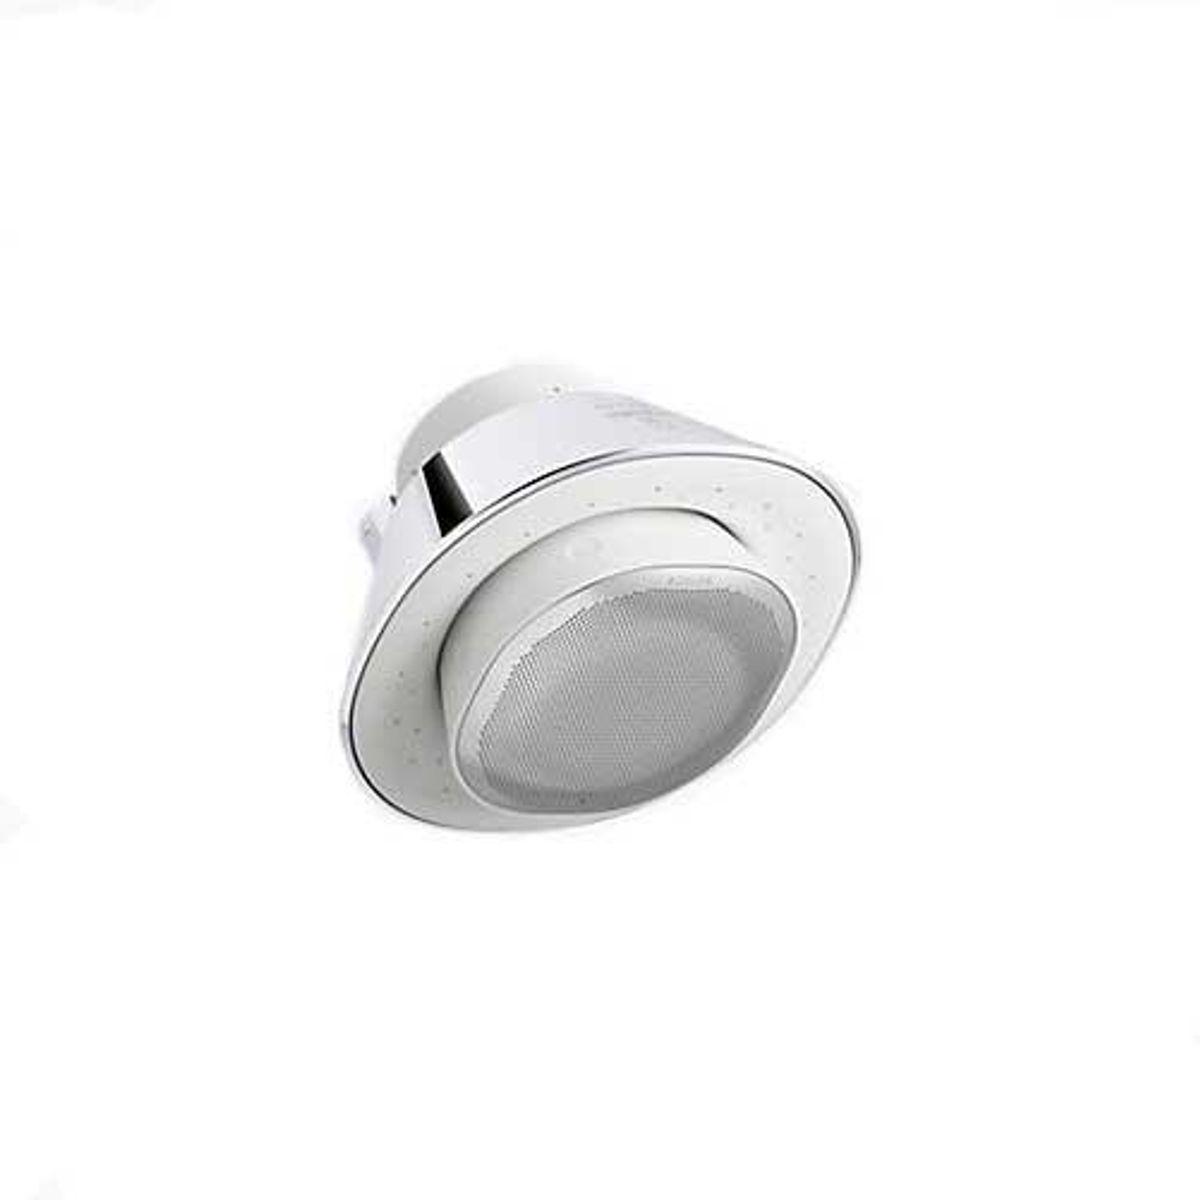 moxie 1.75 gpm showerhead and wireless speaker